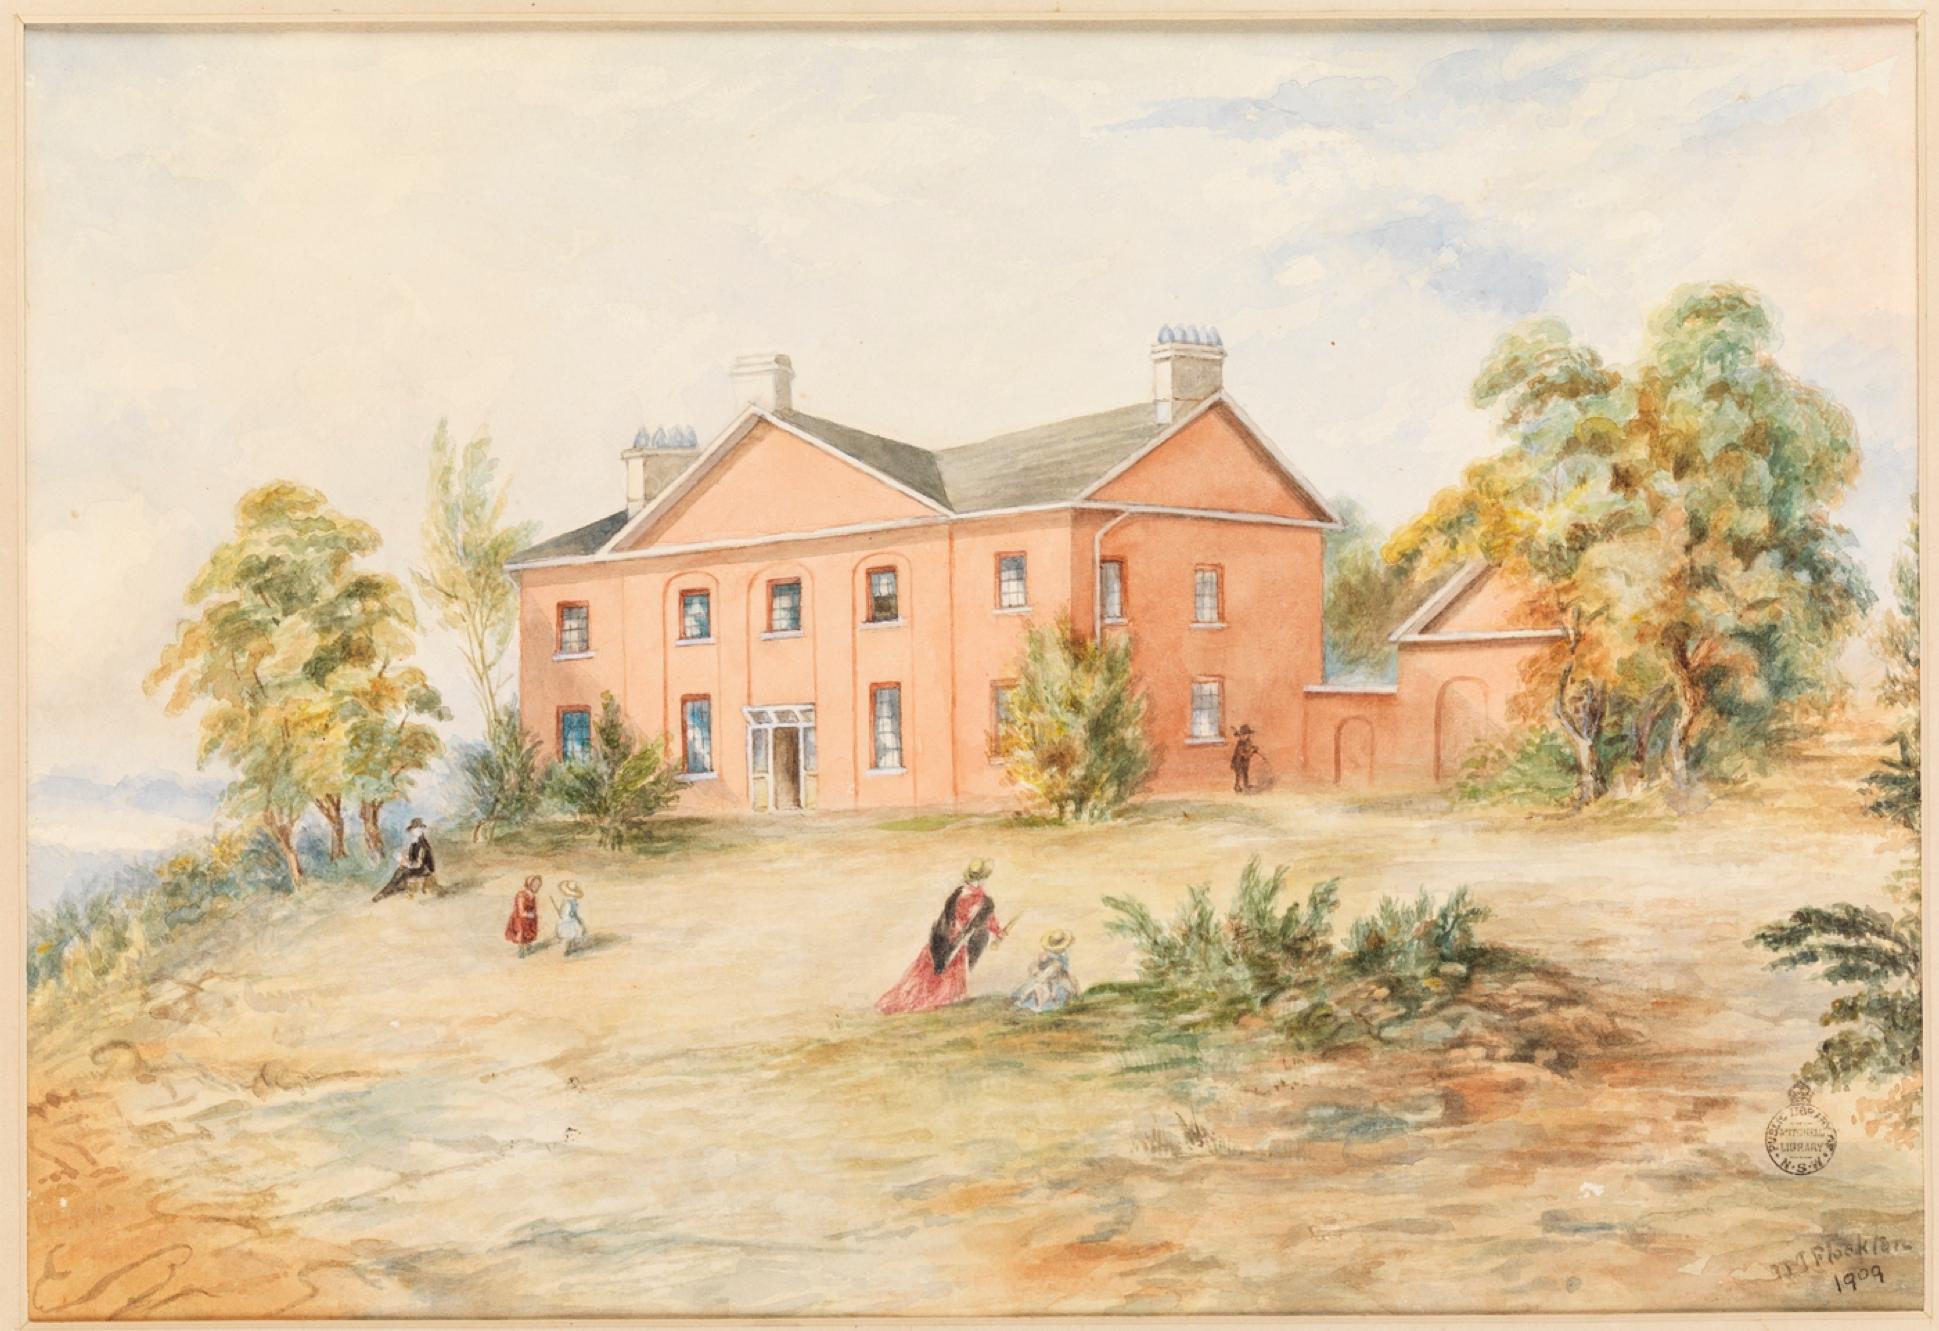 St. John's Parsonage, Parramatta, St. John's Rectory, The Cedars, Reverend Samuel Marsden, St. John's Cemetery Project, Old Parramattans, Francis Greenway